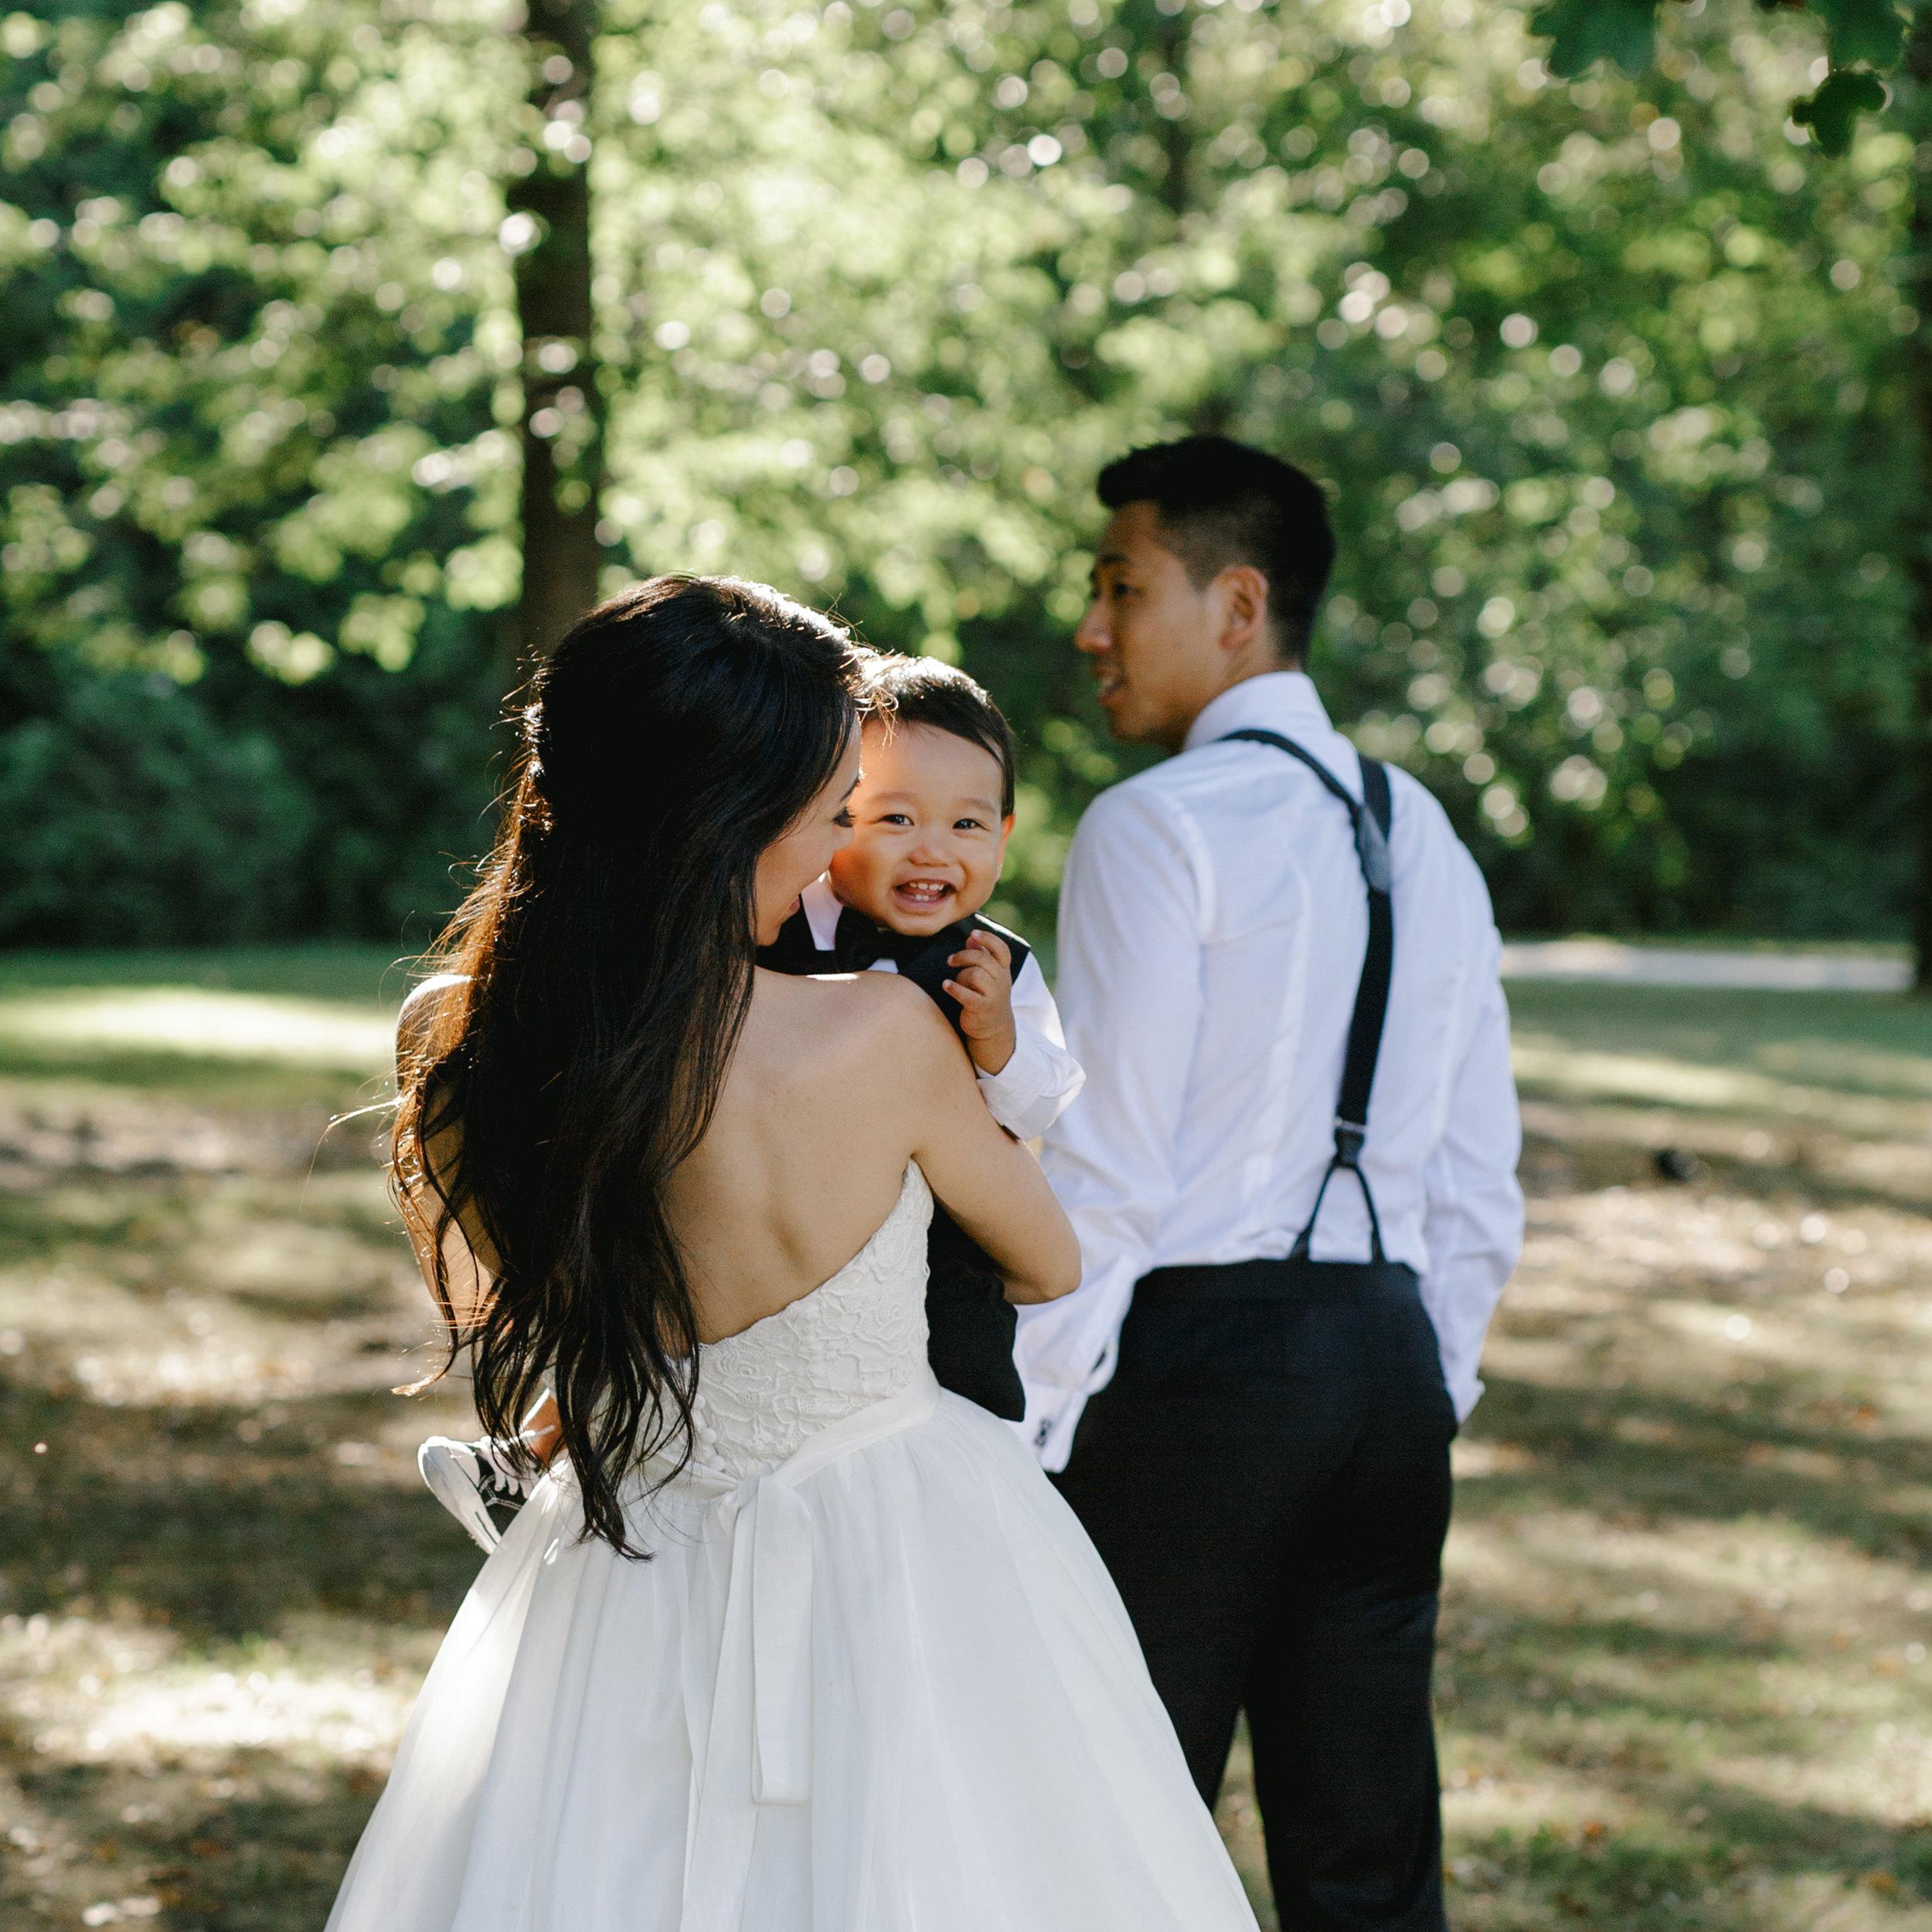 herafilms_wedding_priscilla_adrian_hera_selects-40.jpg